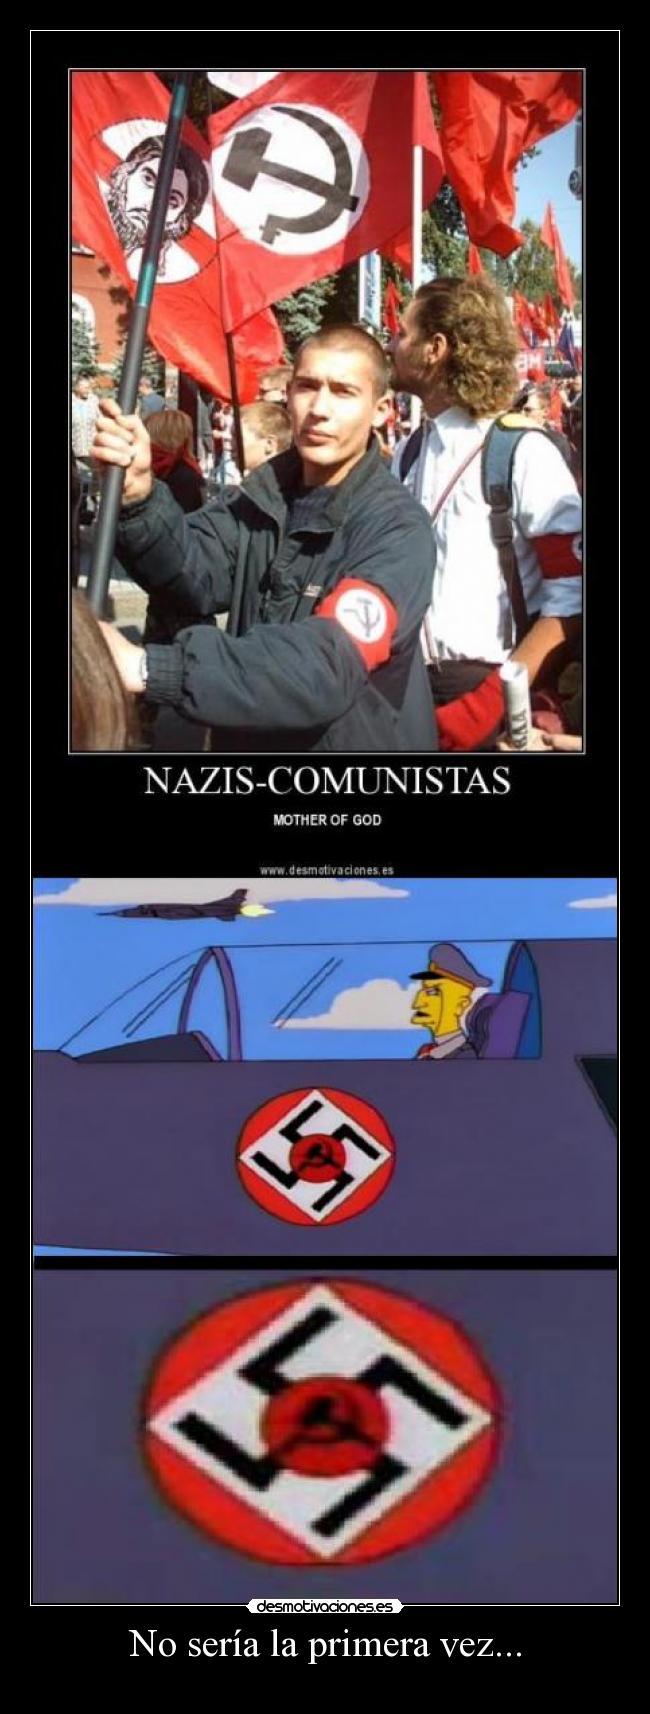 Imagenes de humor Comunista y Capitalista Comunistasnazis